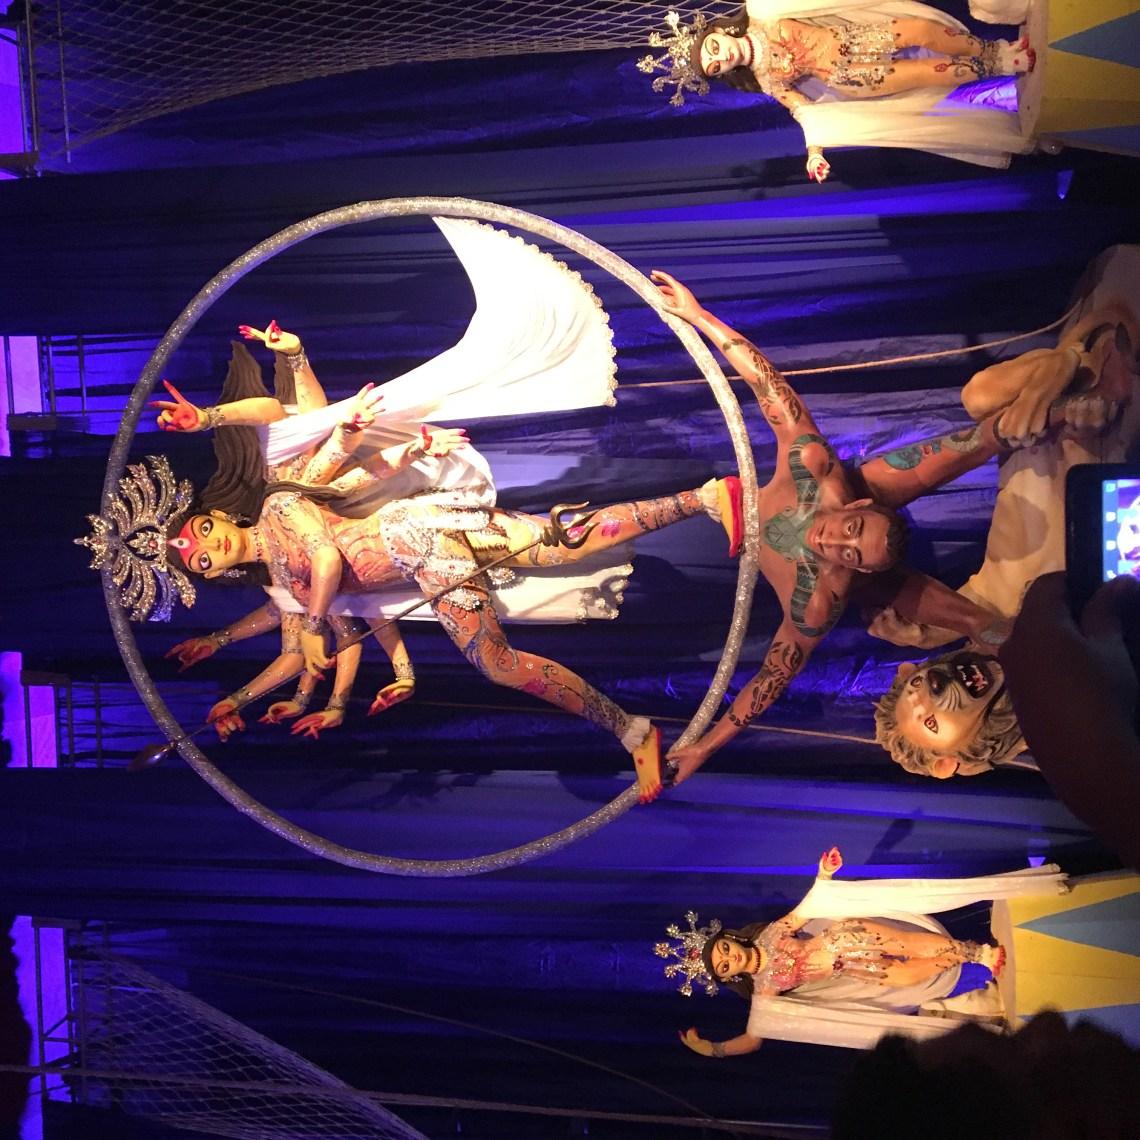 The Aeroibatic Durga idol